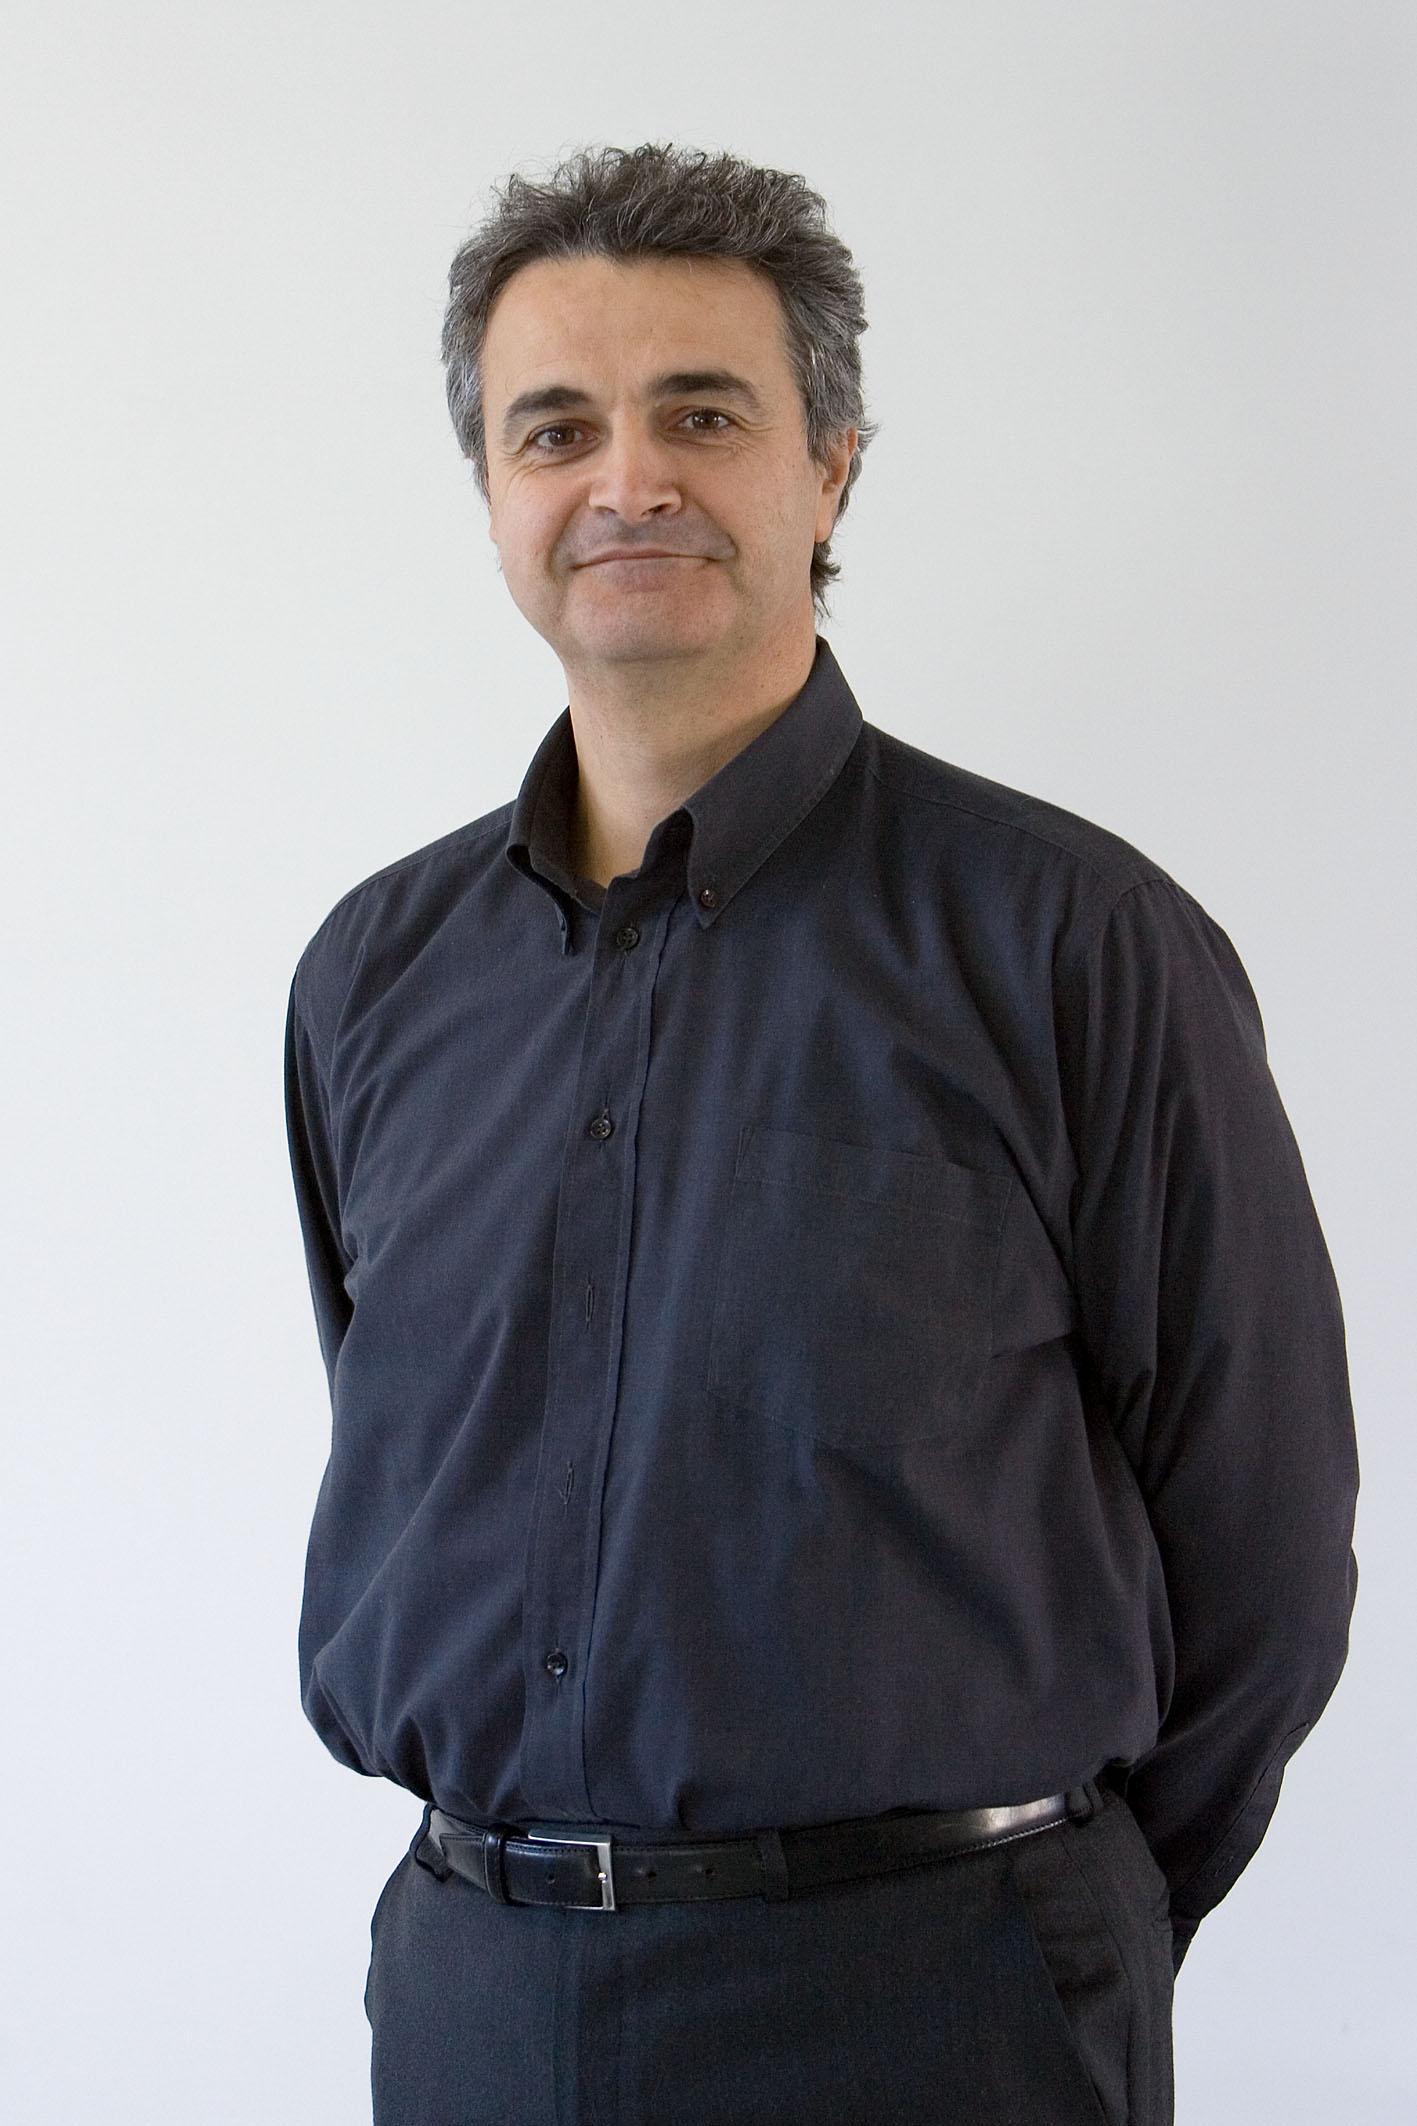 Fausto Toni